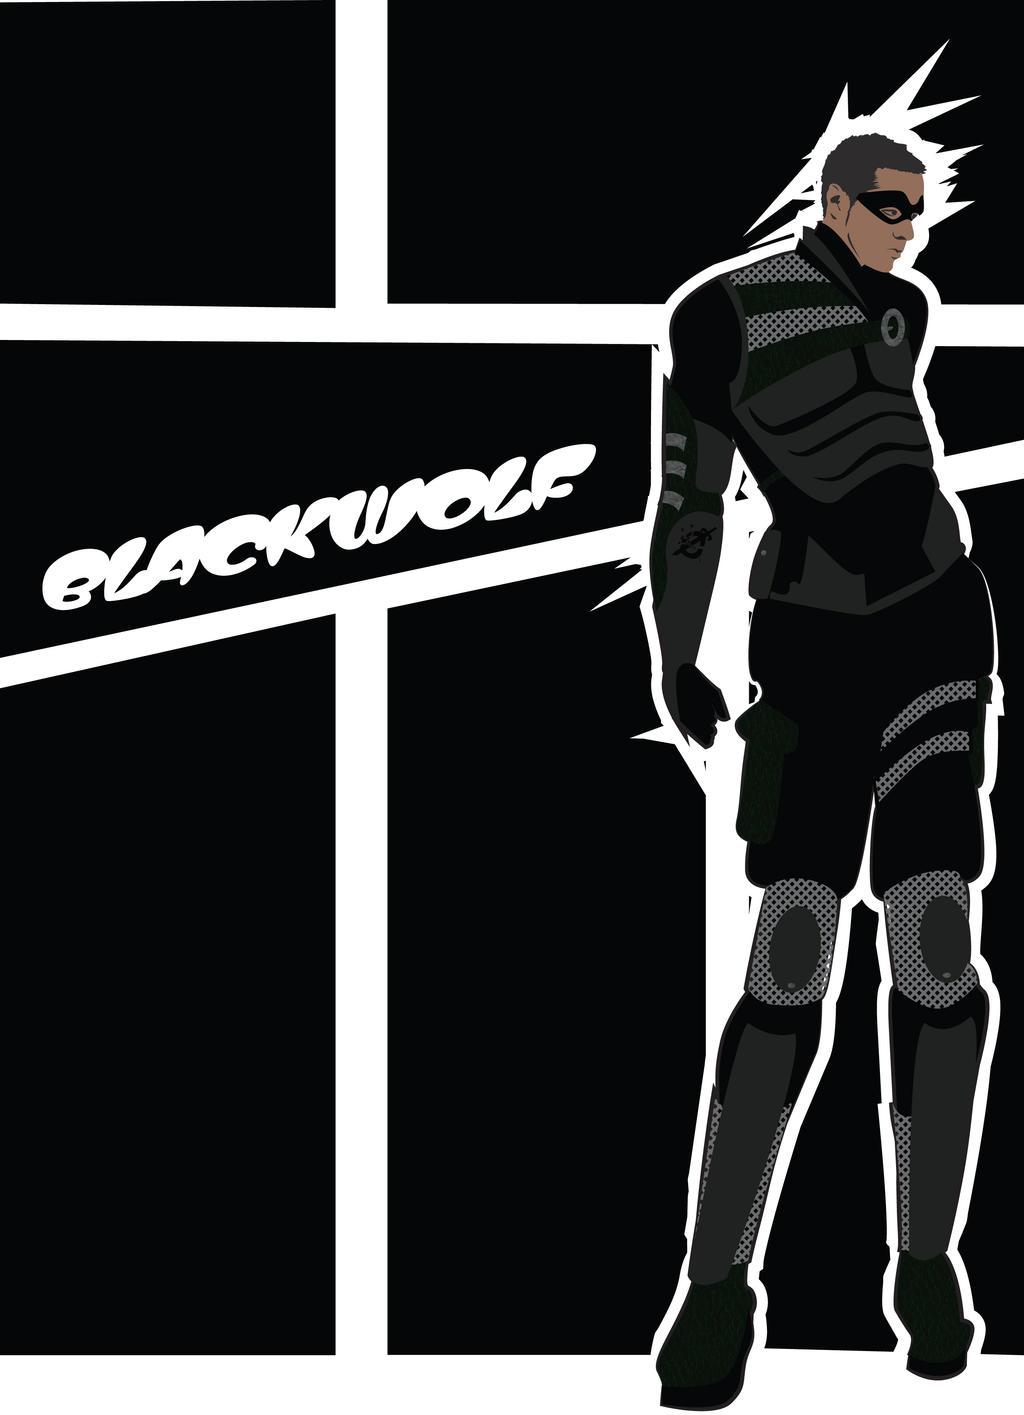 Costume Design: Soon I Will Be Invincible: Wolf by phantomonex